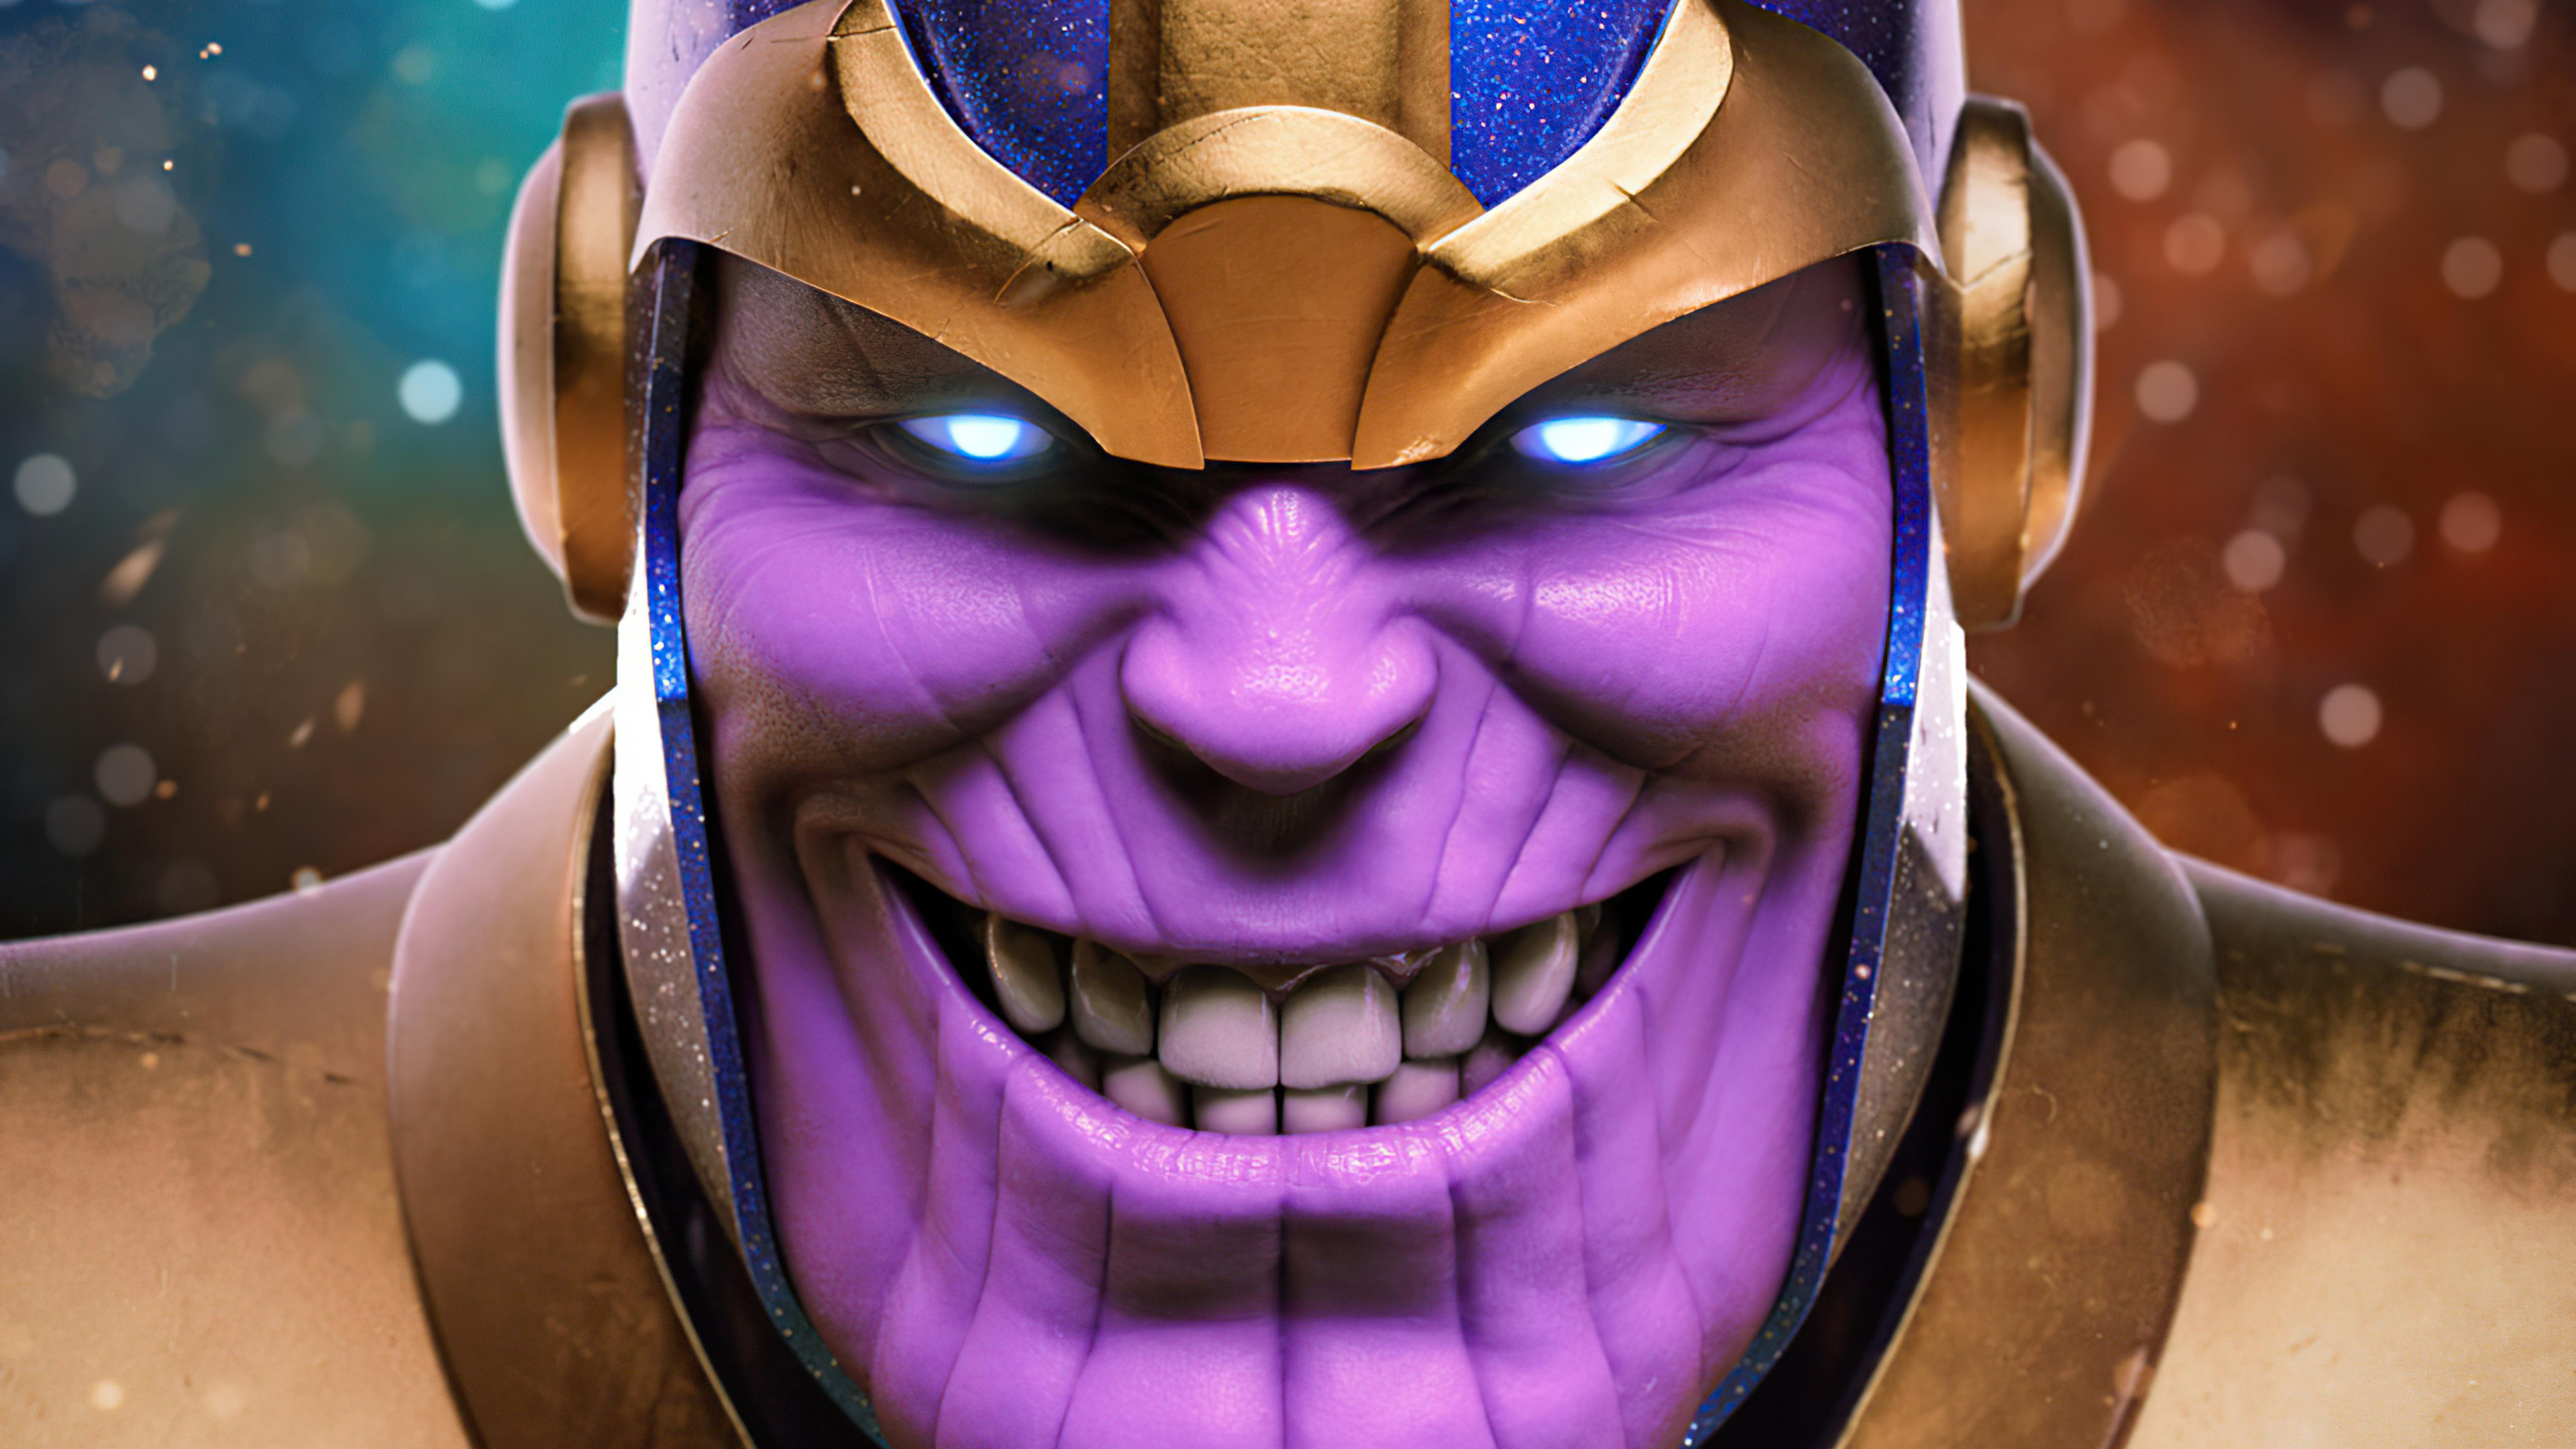 mr thanos 4k 1617446729 - Mr Thanos 4k - Mr Thanos 4k wallpapers